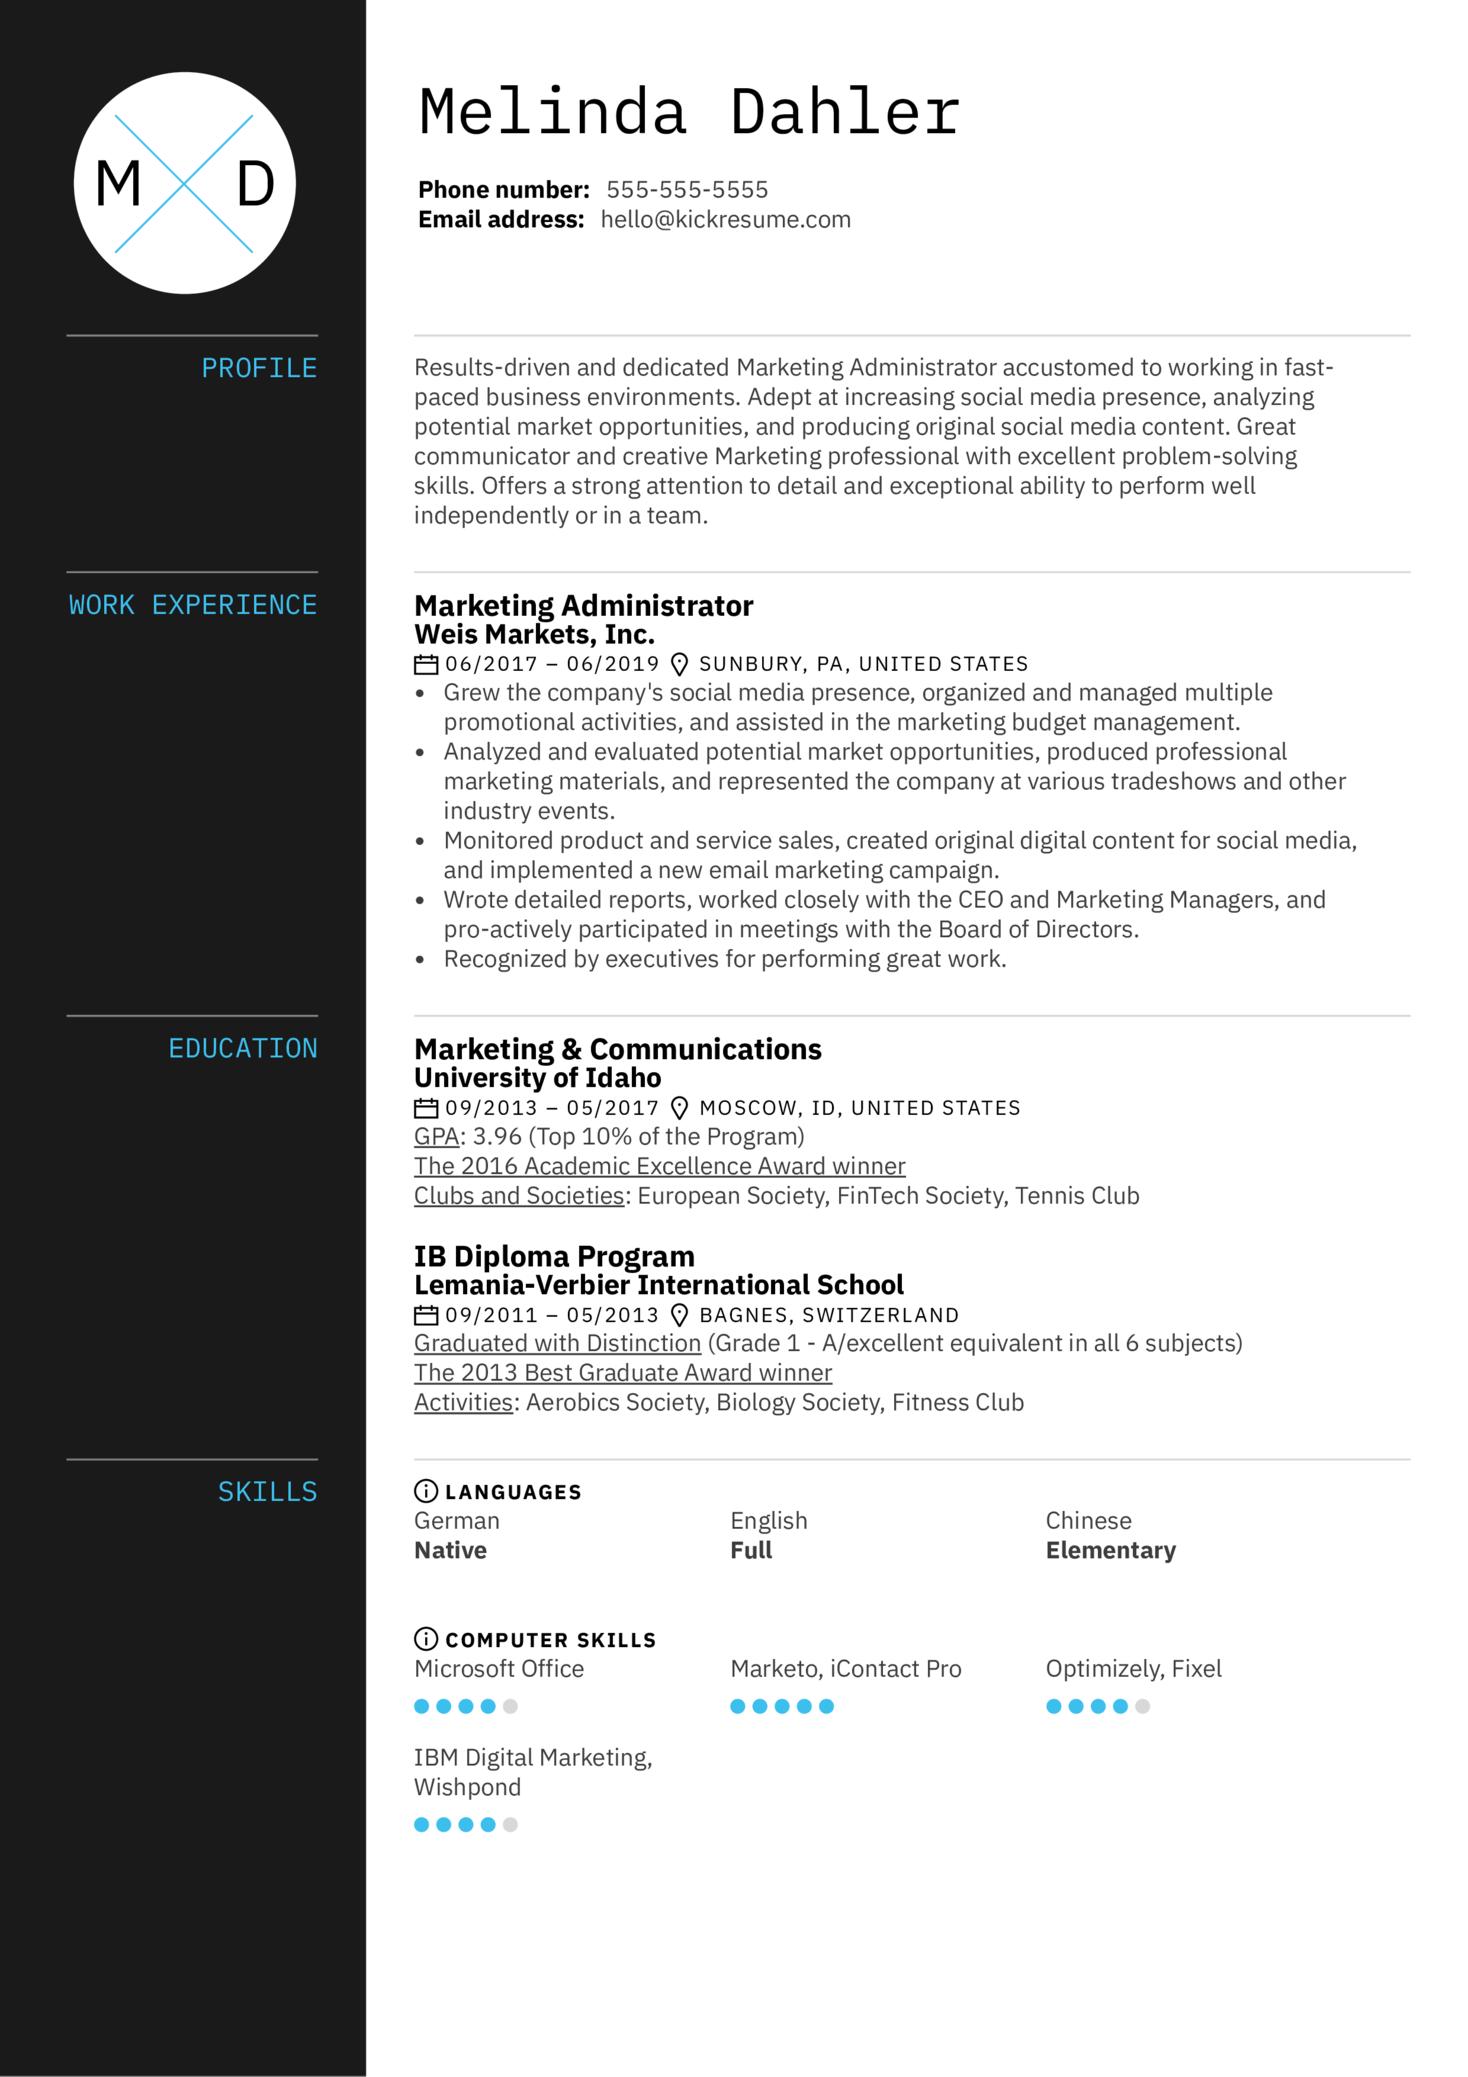 Marketing Administrator Resume Example (Part 1)